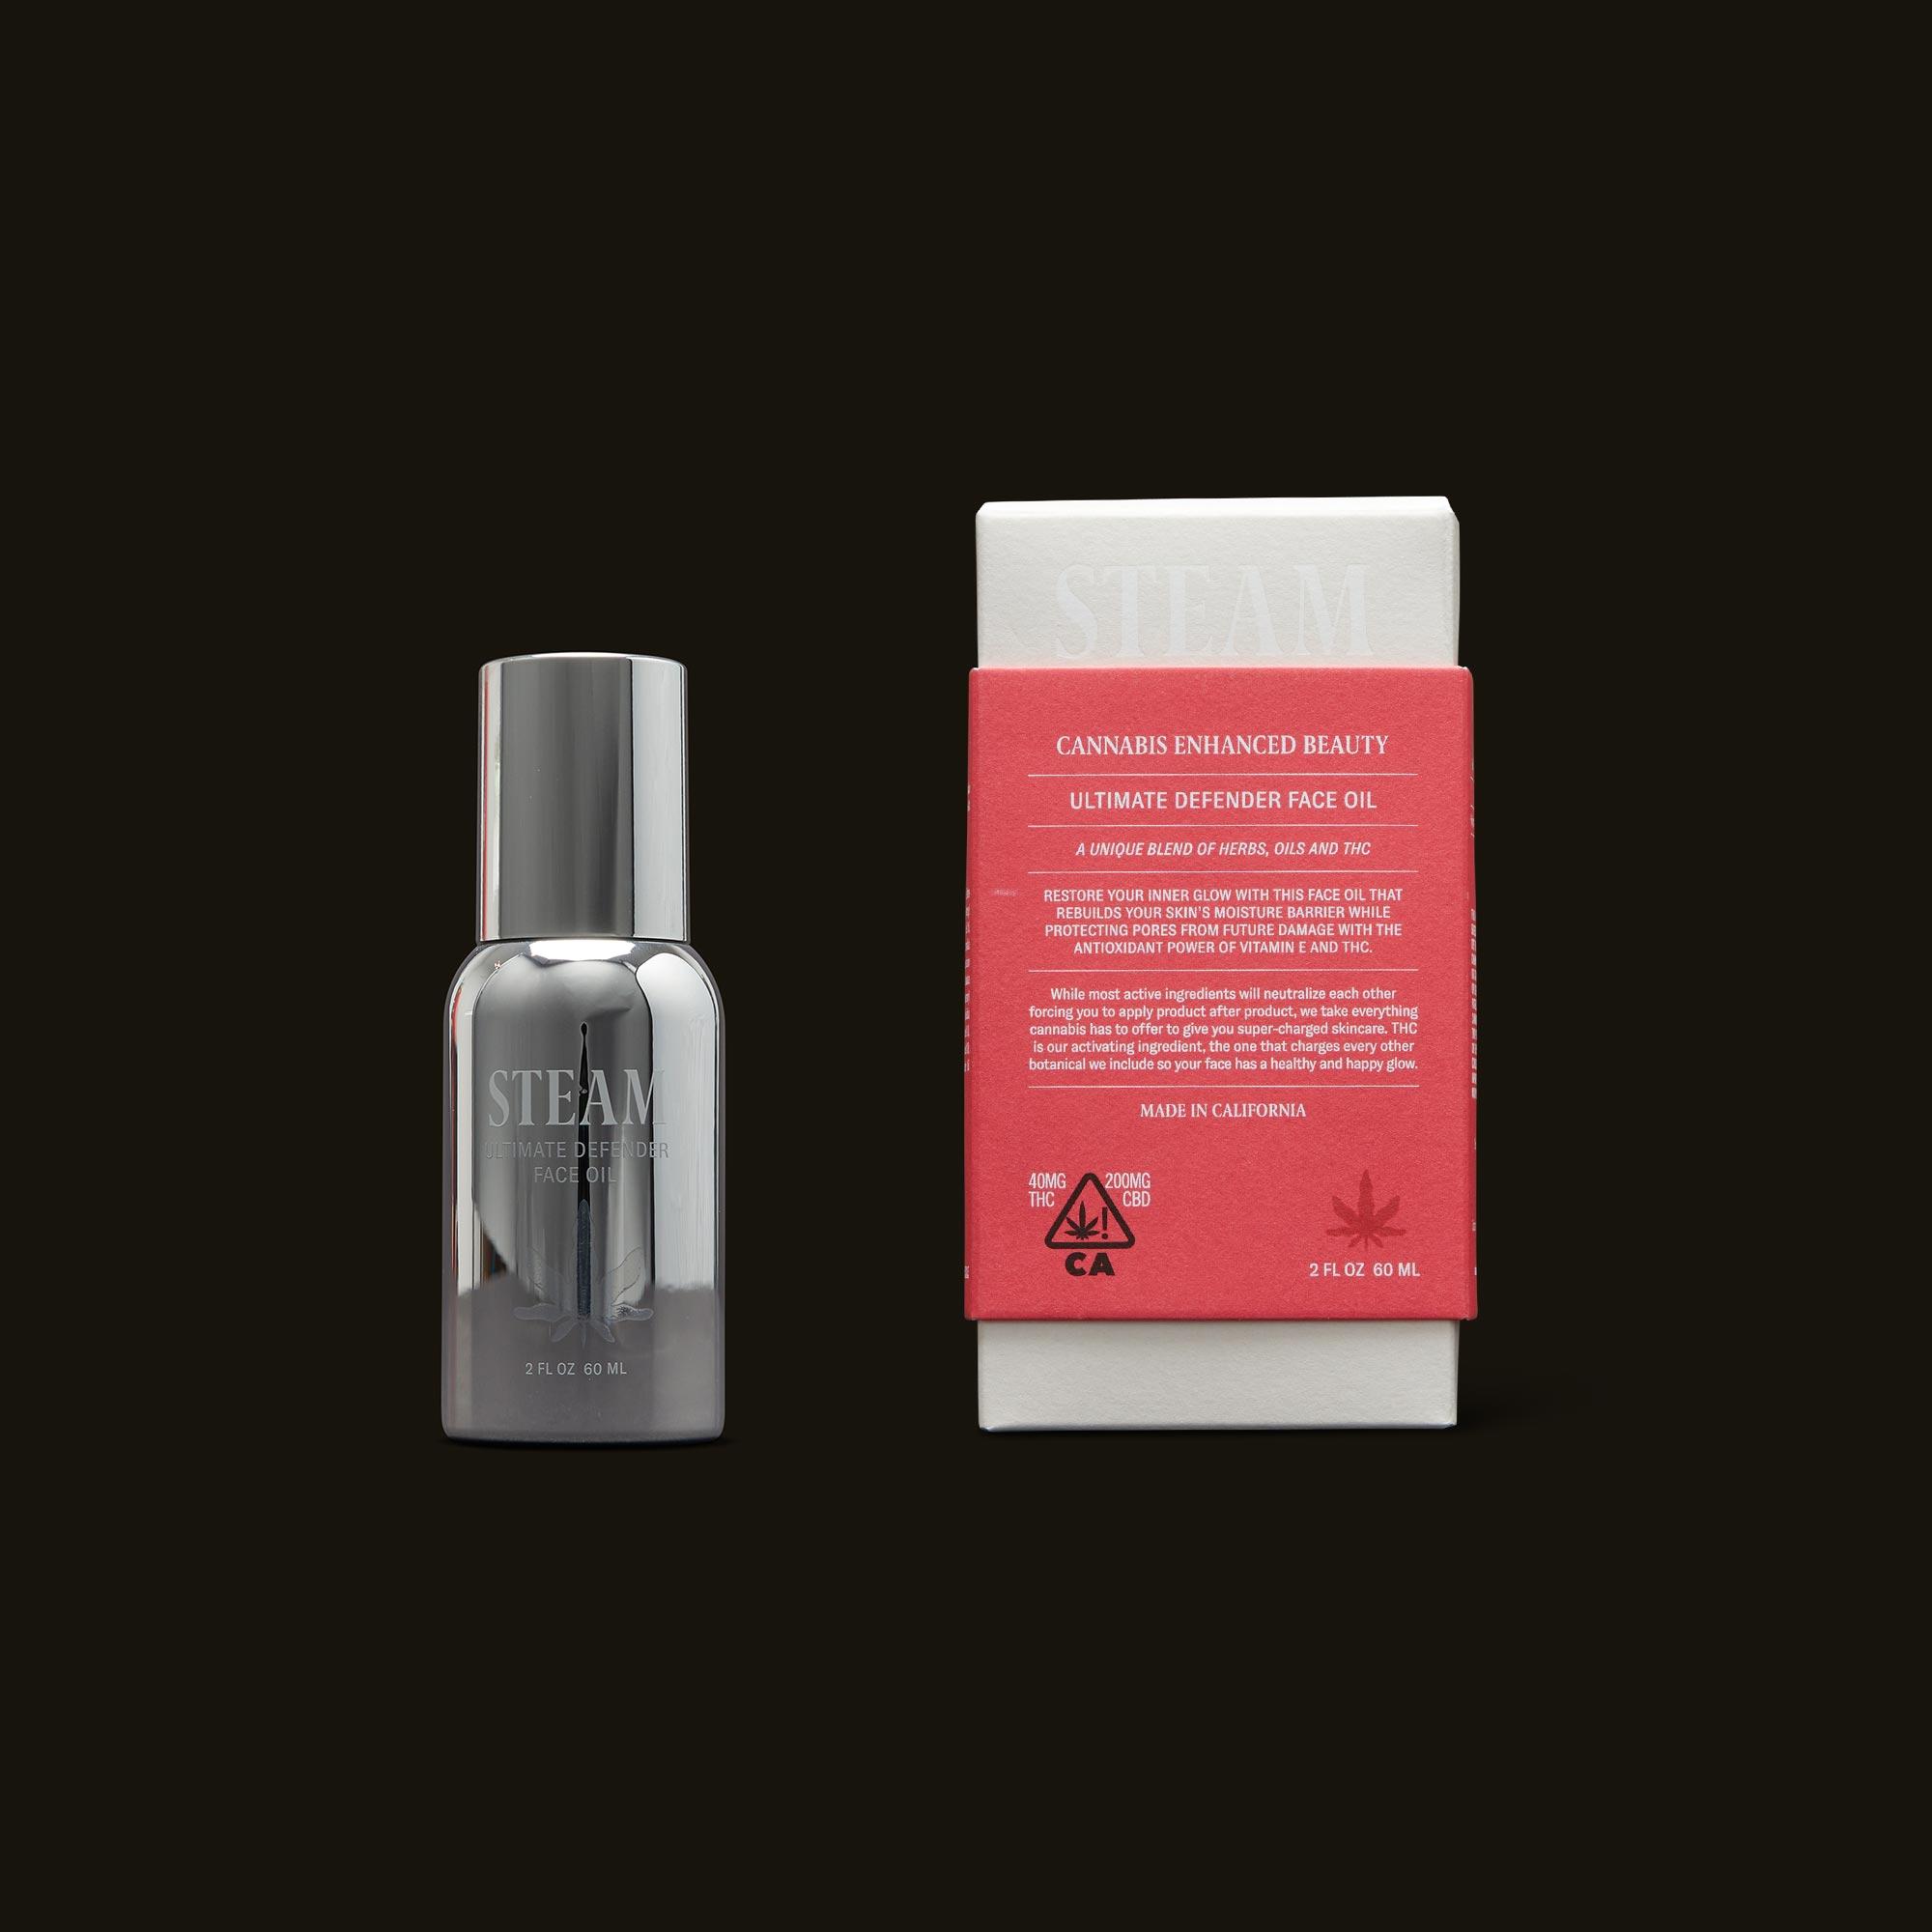 STEAM Ultimate Defender Face Oil